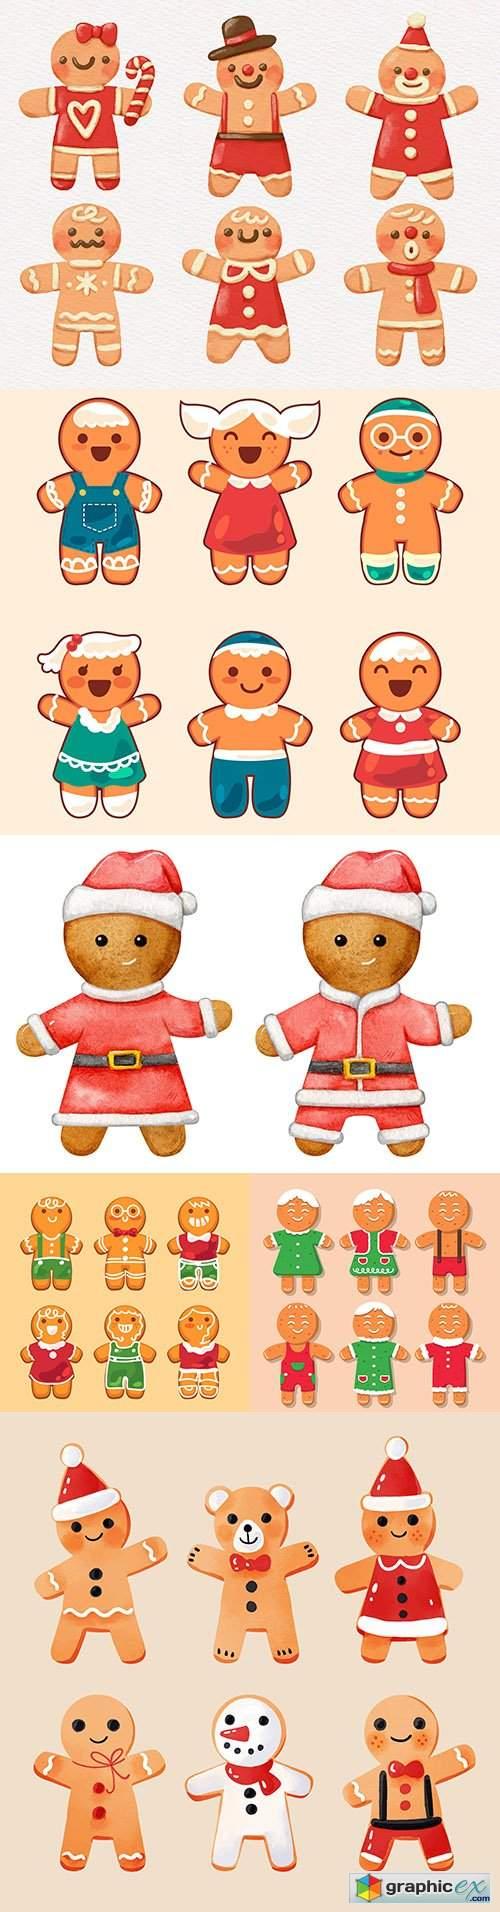 Christmas baking decorative gingerbread man flat design